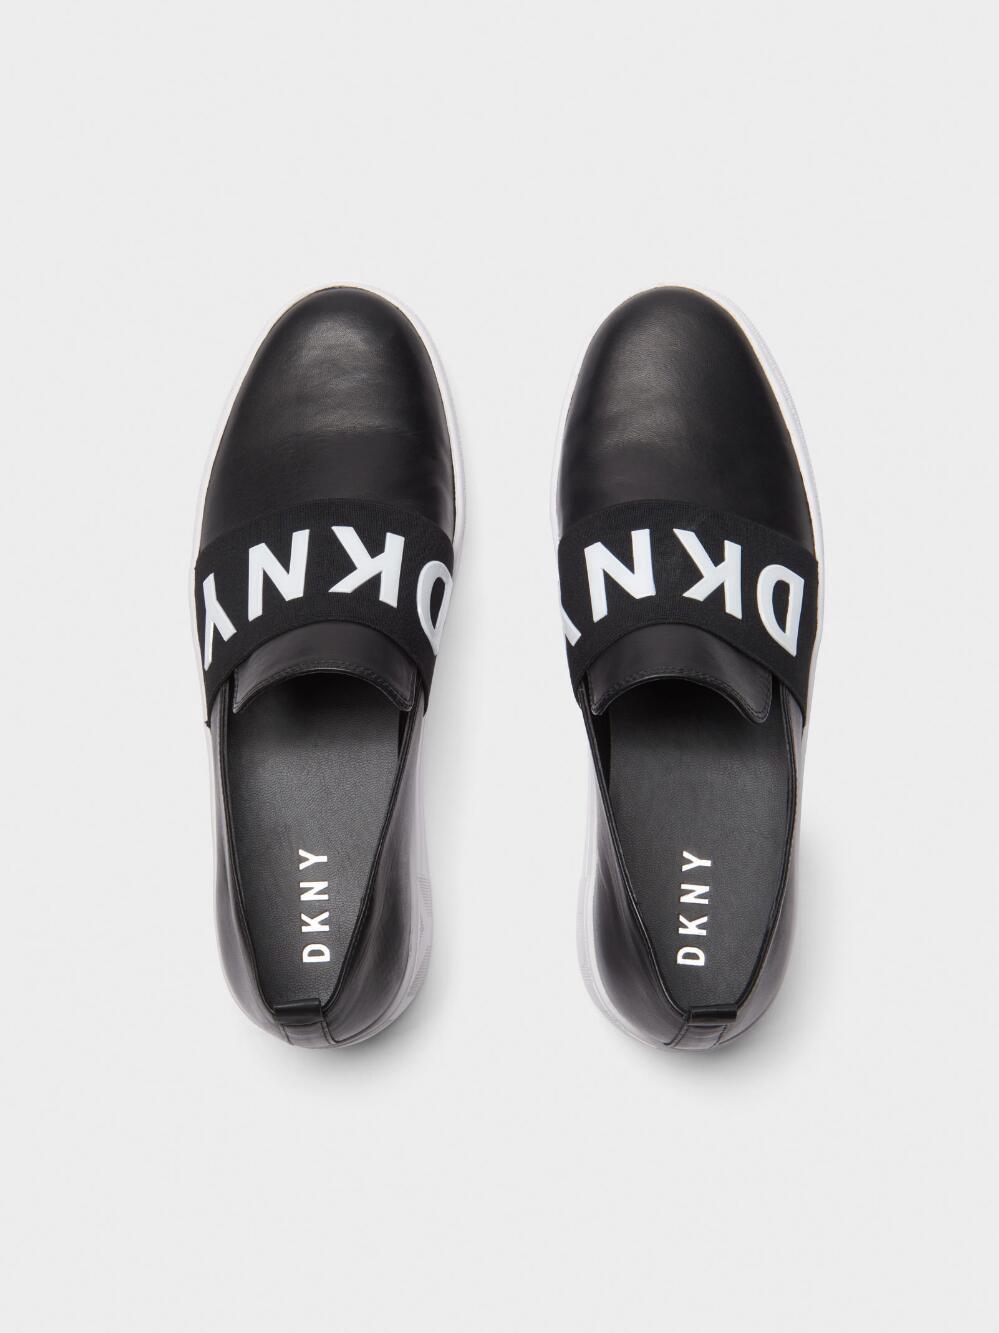 b463fa6587fa Dkny Alicia Leather Platform Slip On Sneaker - Black/White 6 ...